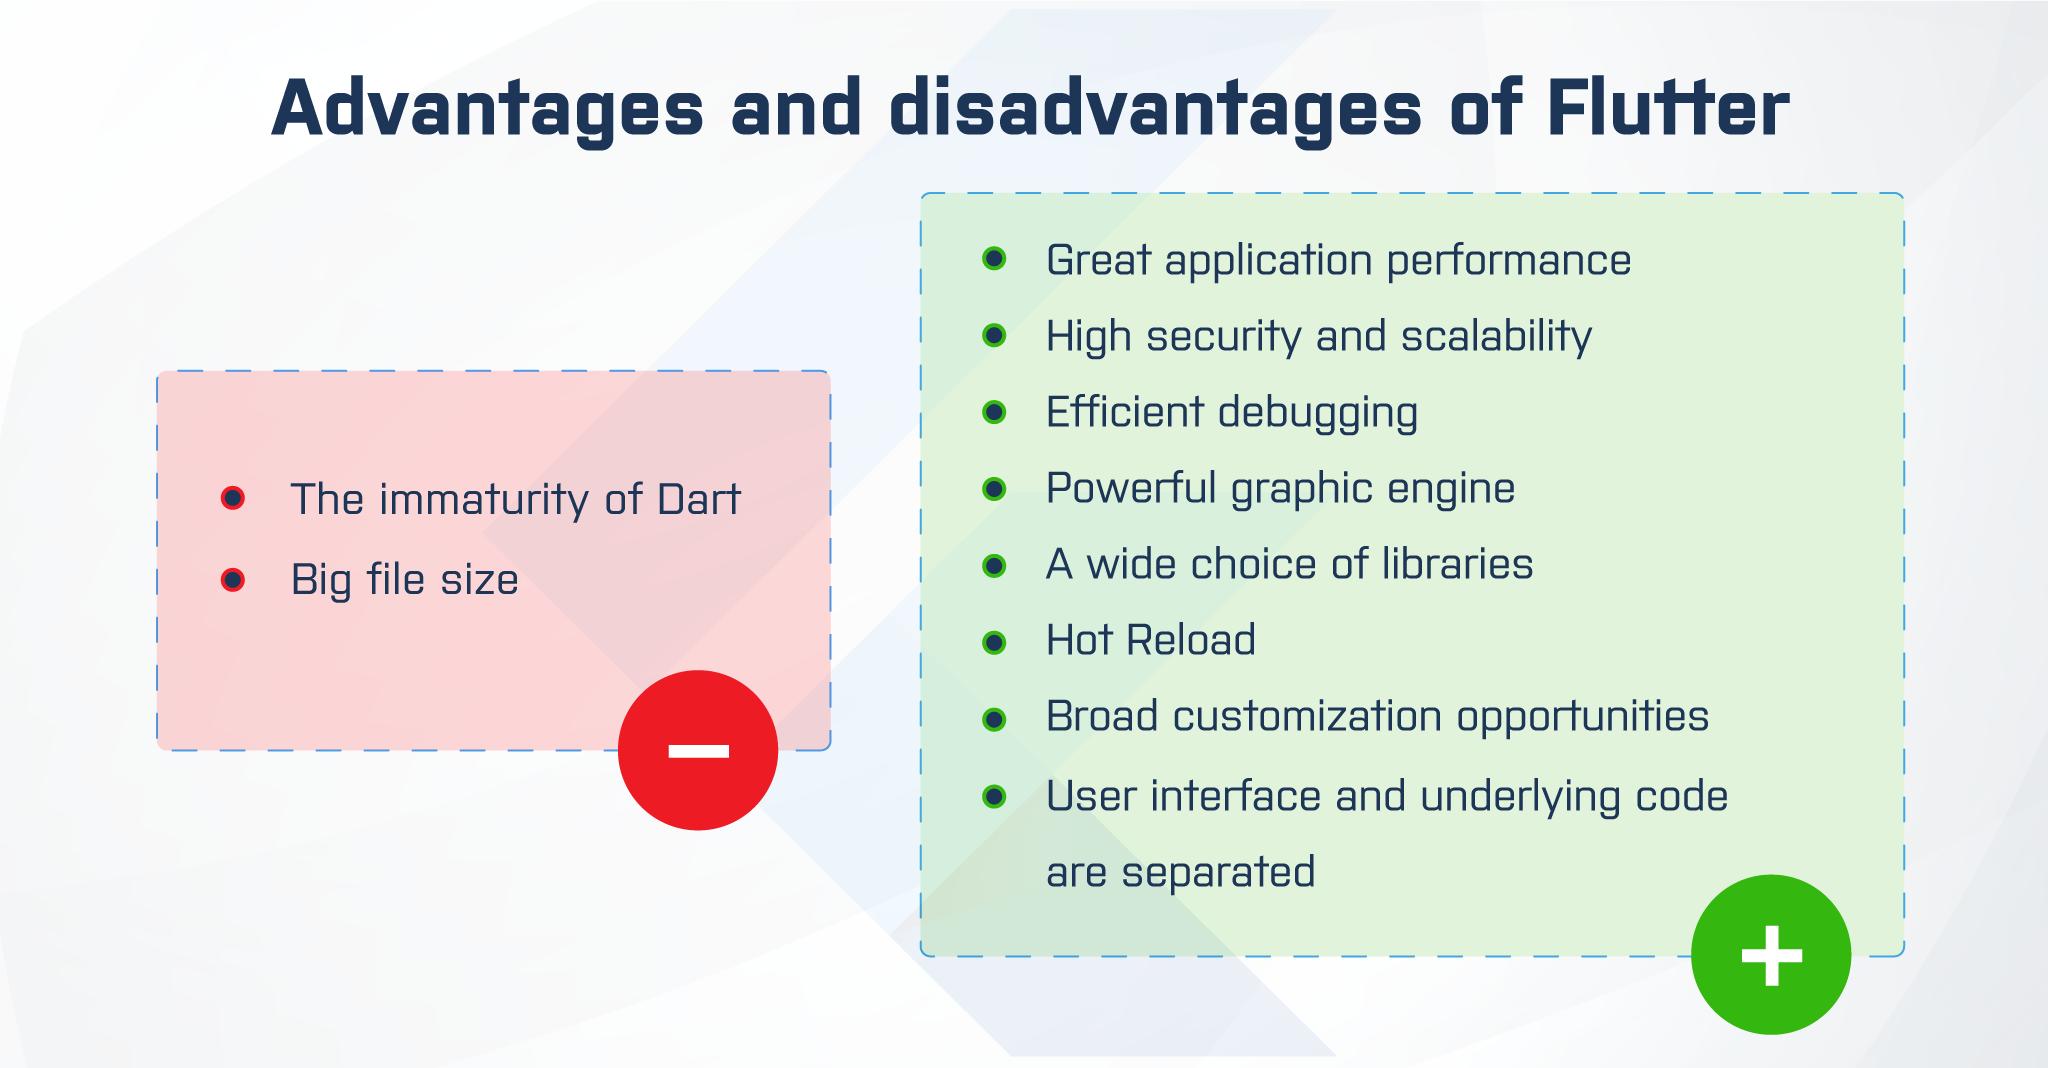 disadvantages and advantages of flutter app development